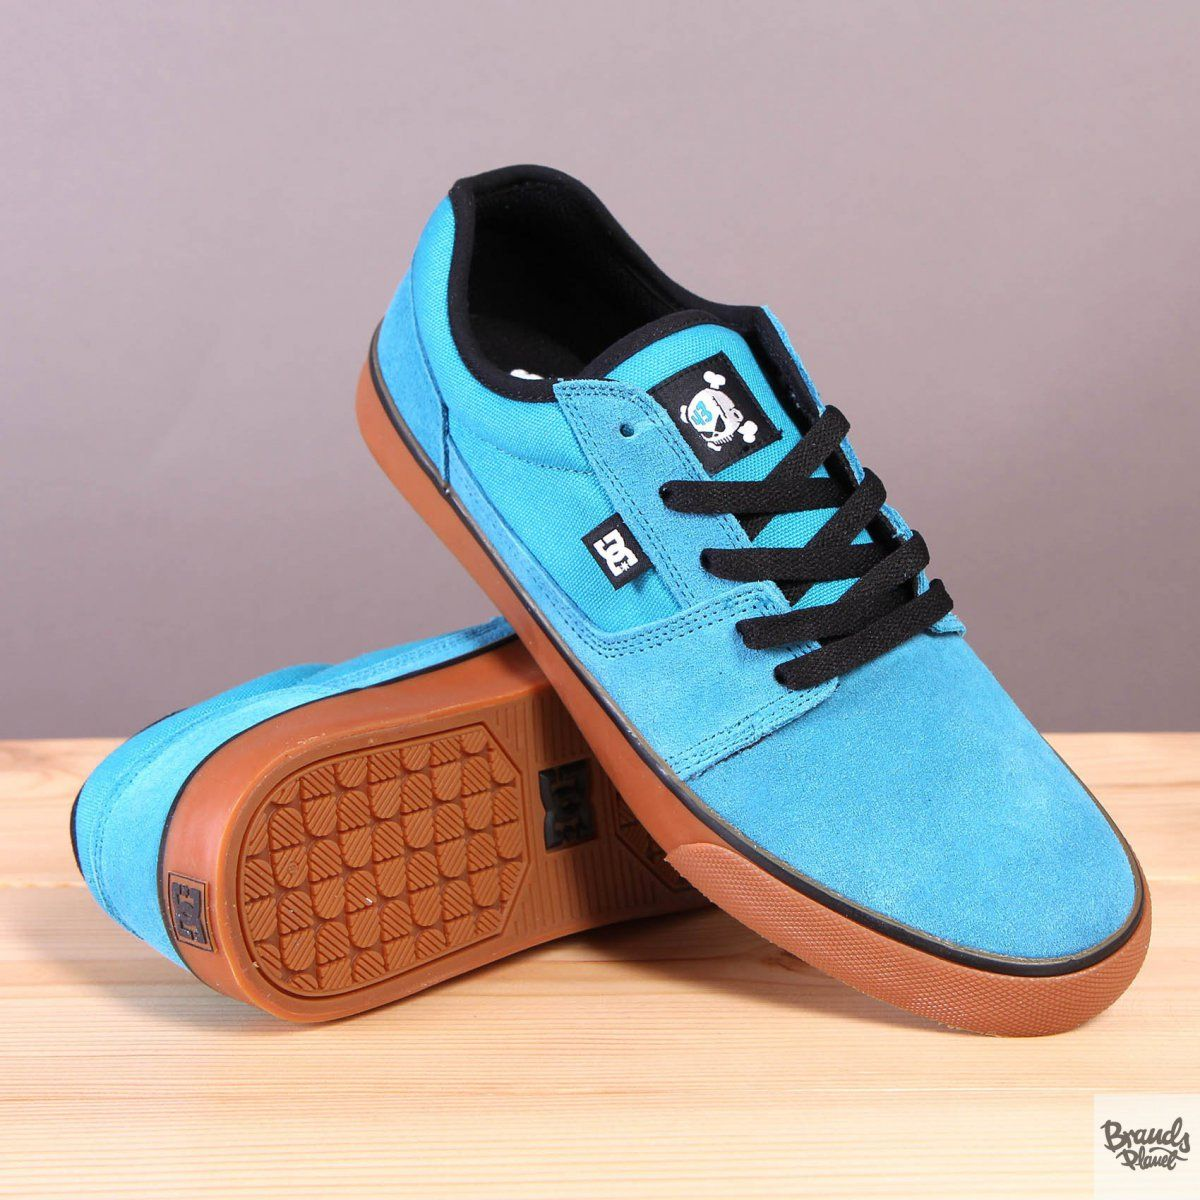 Brandsplanet Pl Mens Shoes Sneakers Dc Shoes Shoes Sneakers